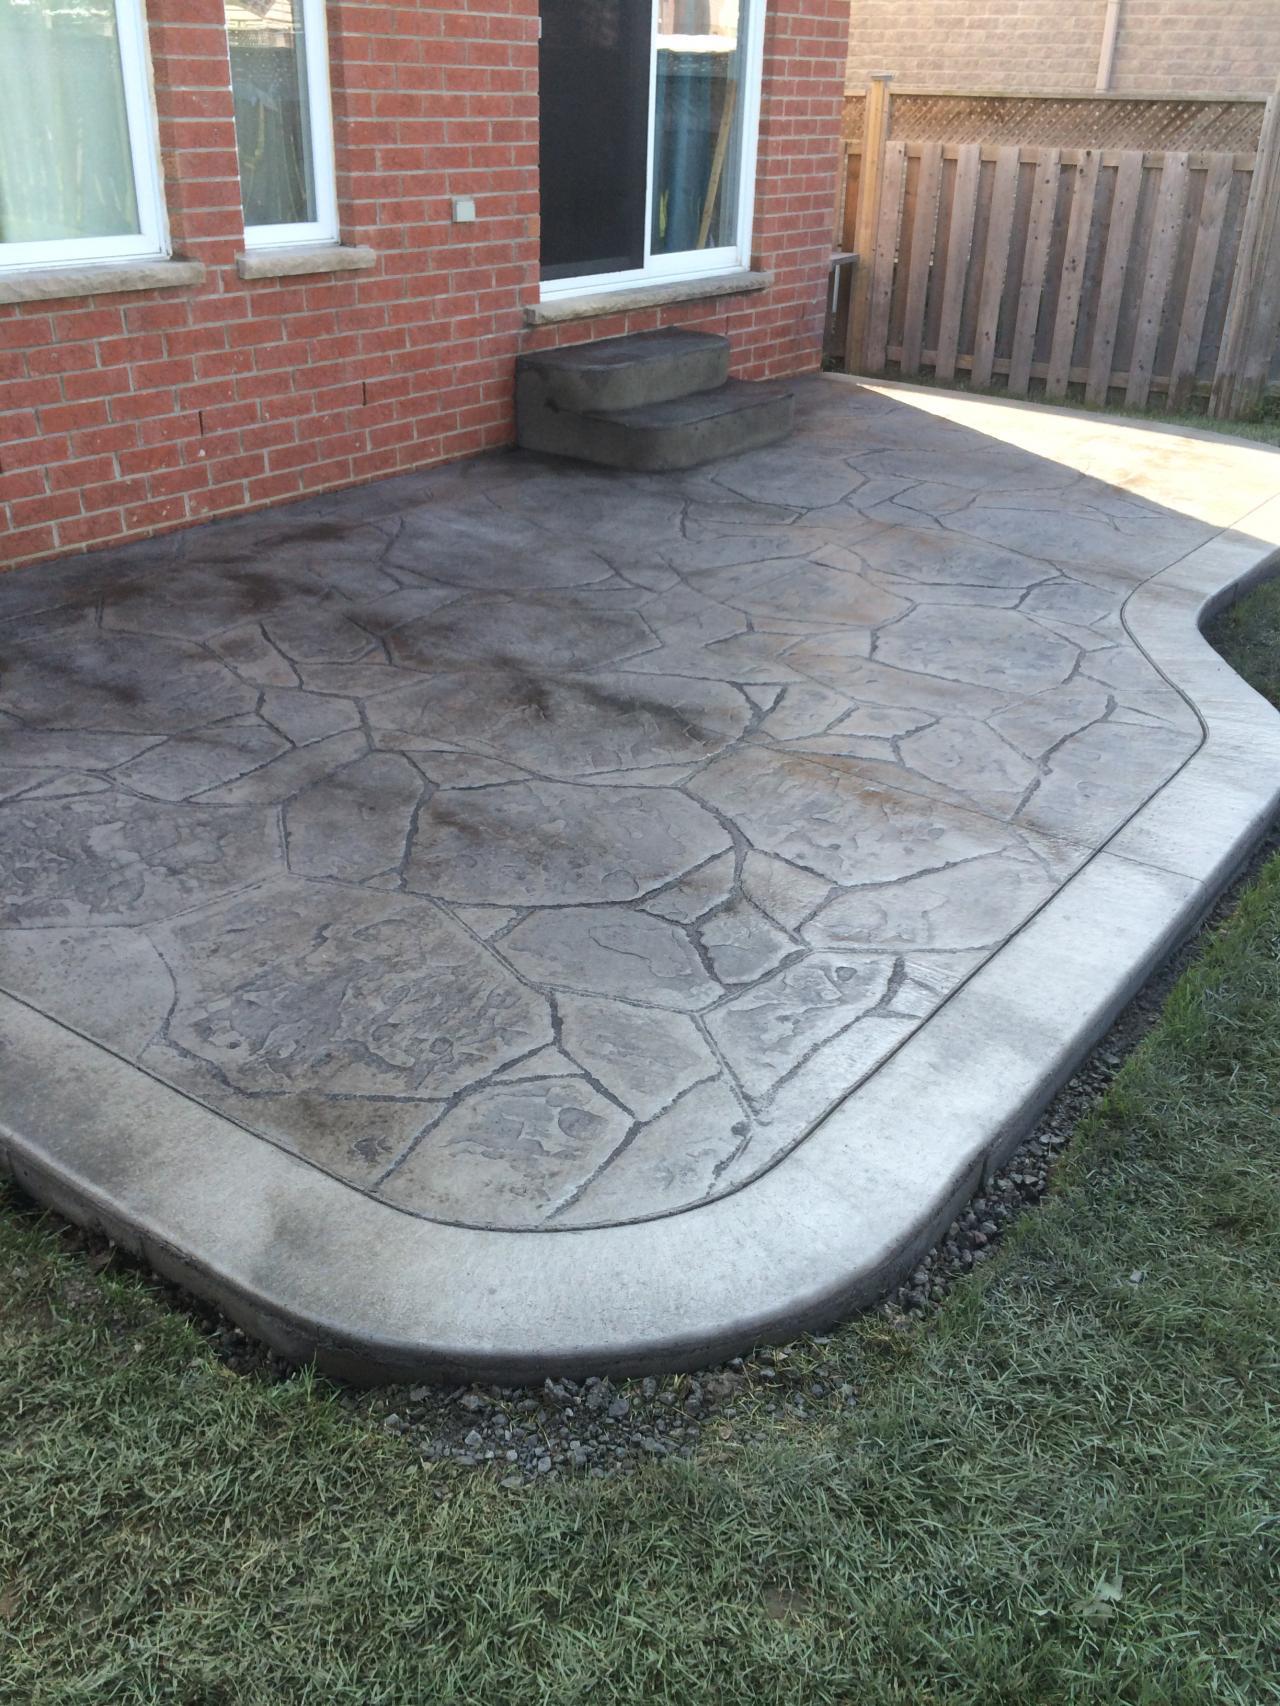 ... Arizona Flagstone Stamped Concrete Patio With Curb Edge Border In  London Ontario ...